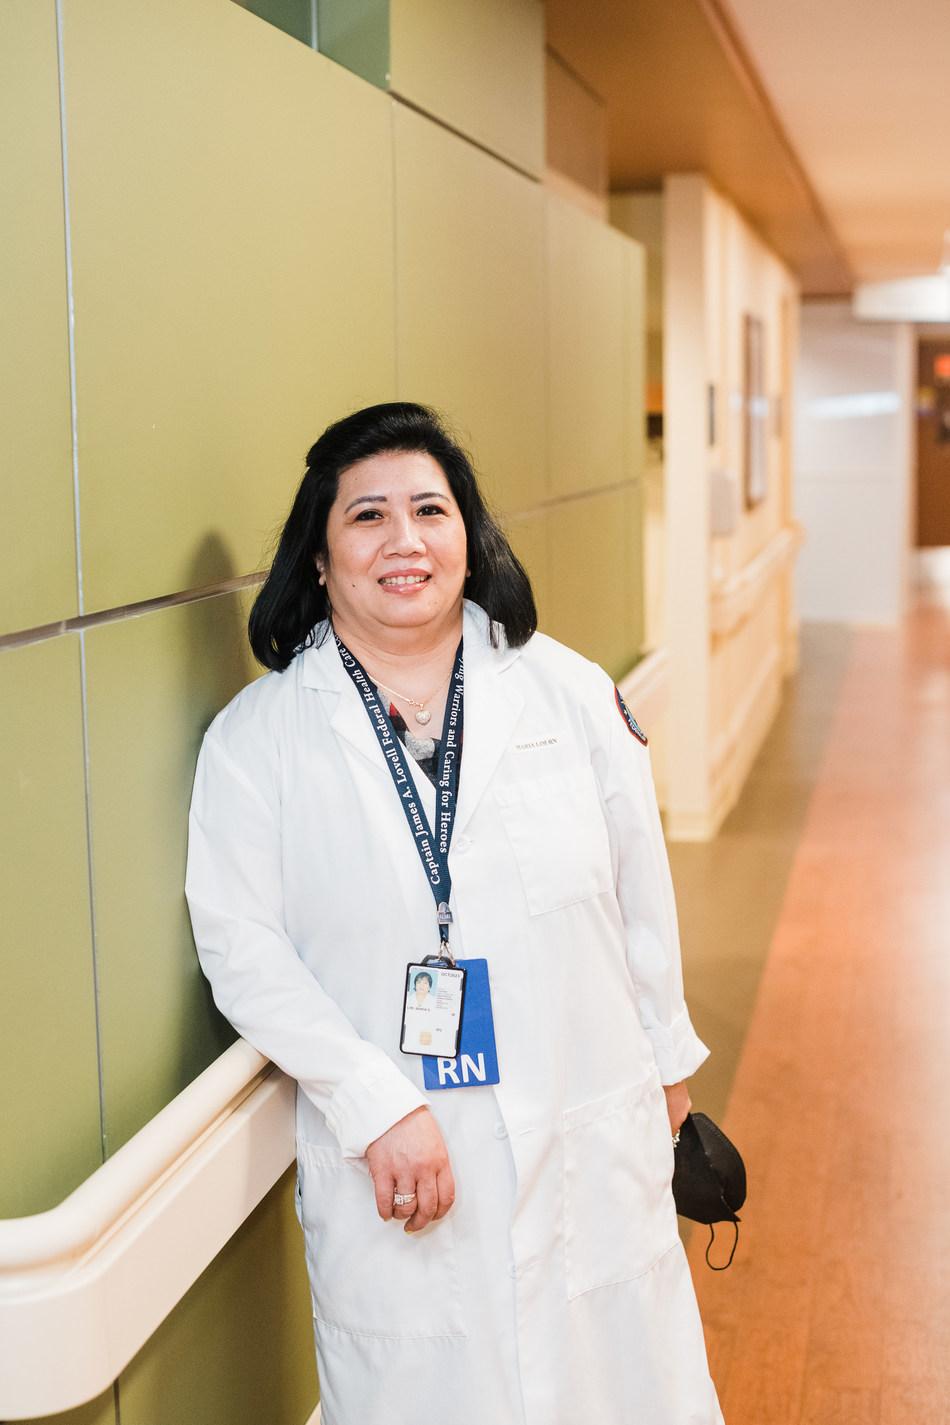 Maria Lim, B.S.N., RN, OCN, BMTCN, was named overall winner of the 2021 Extraordinary Healer® Award for Oncology Nursing.